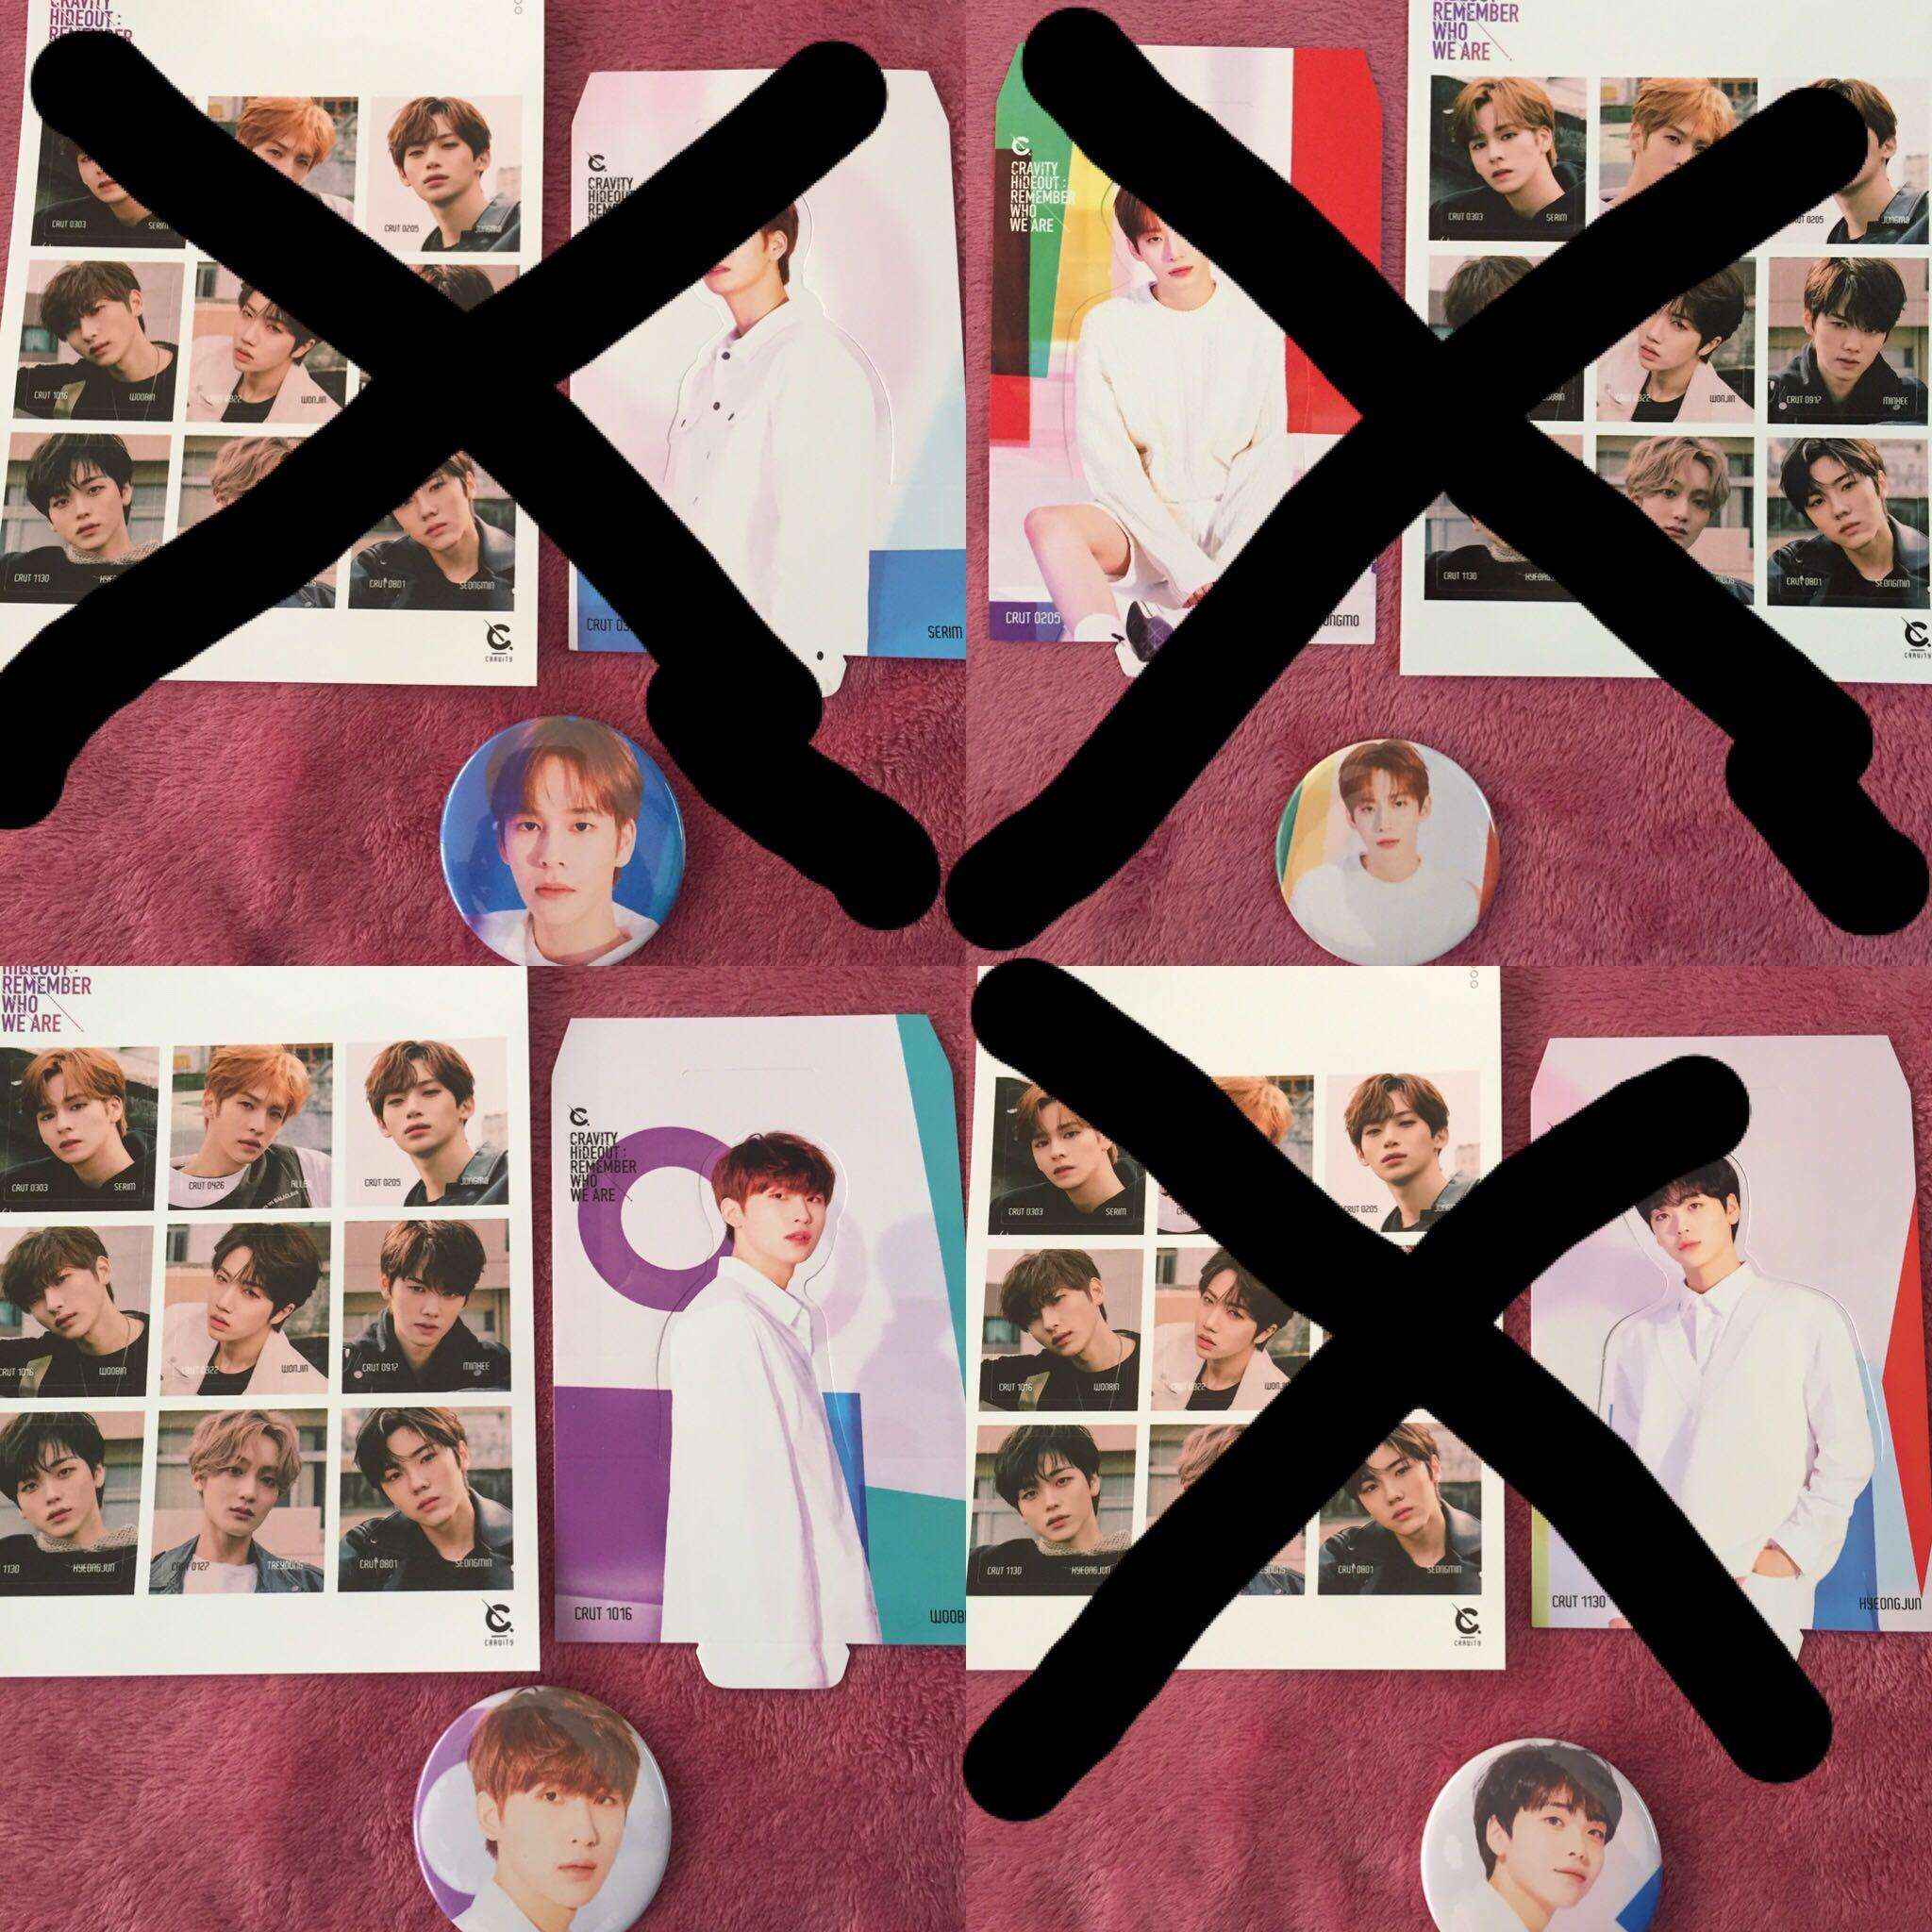 Cravity Standee and Sticker Serim Woobin Wonjin Minhee Hyeongjun